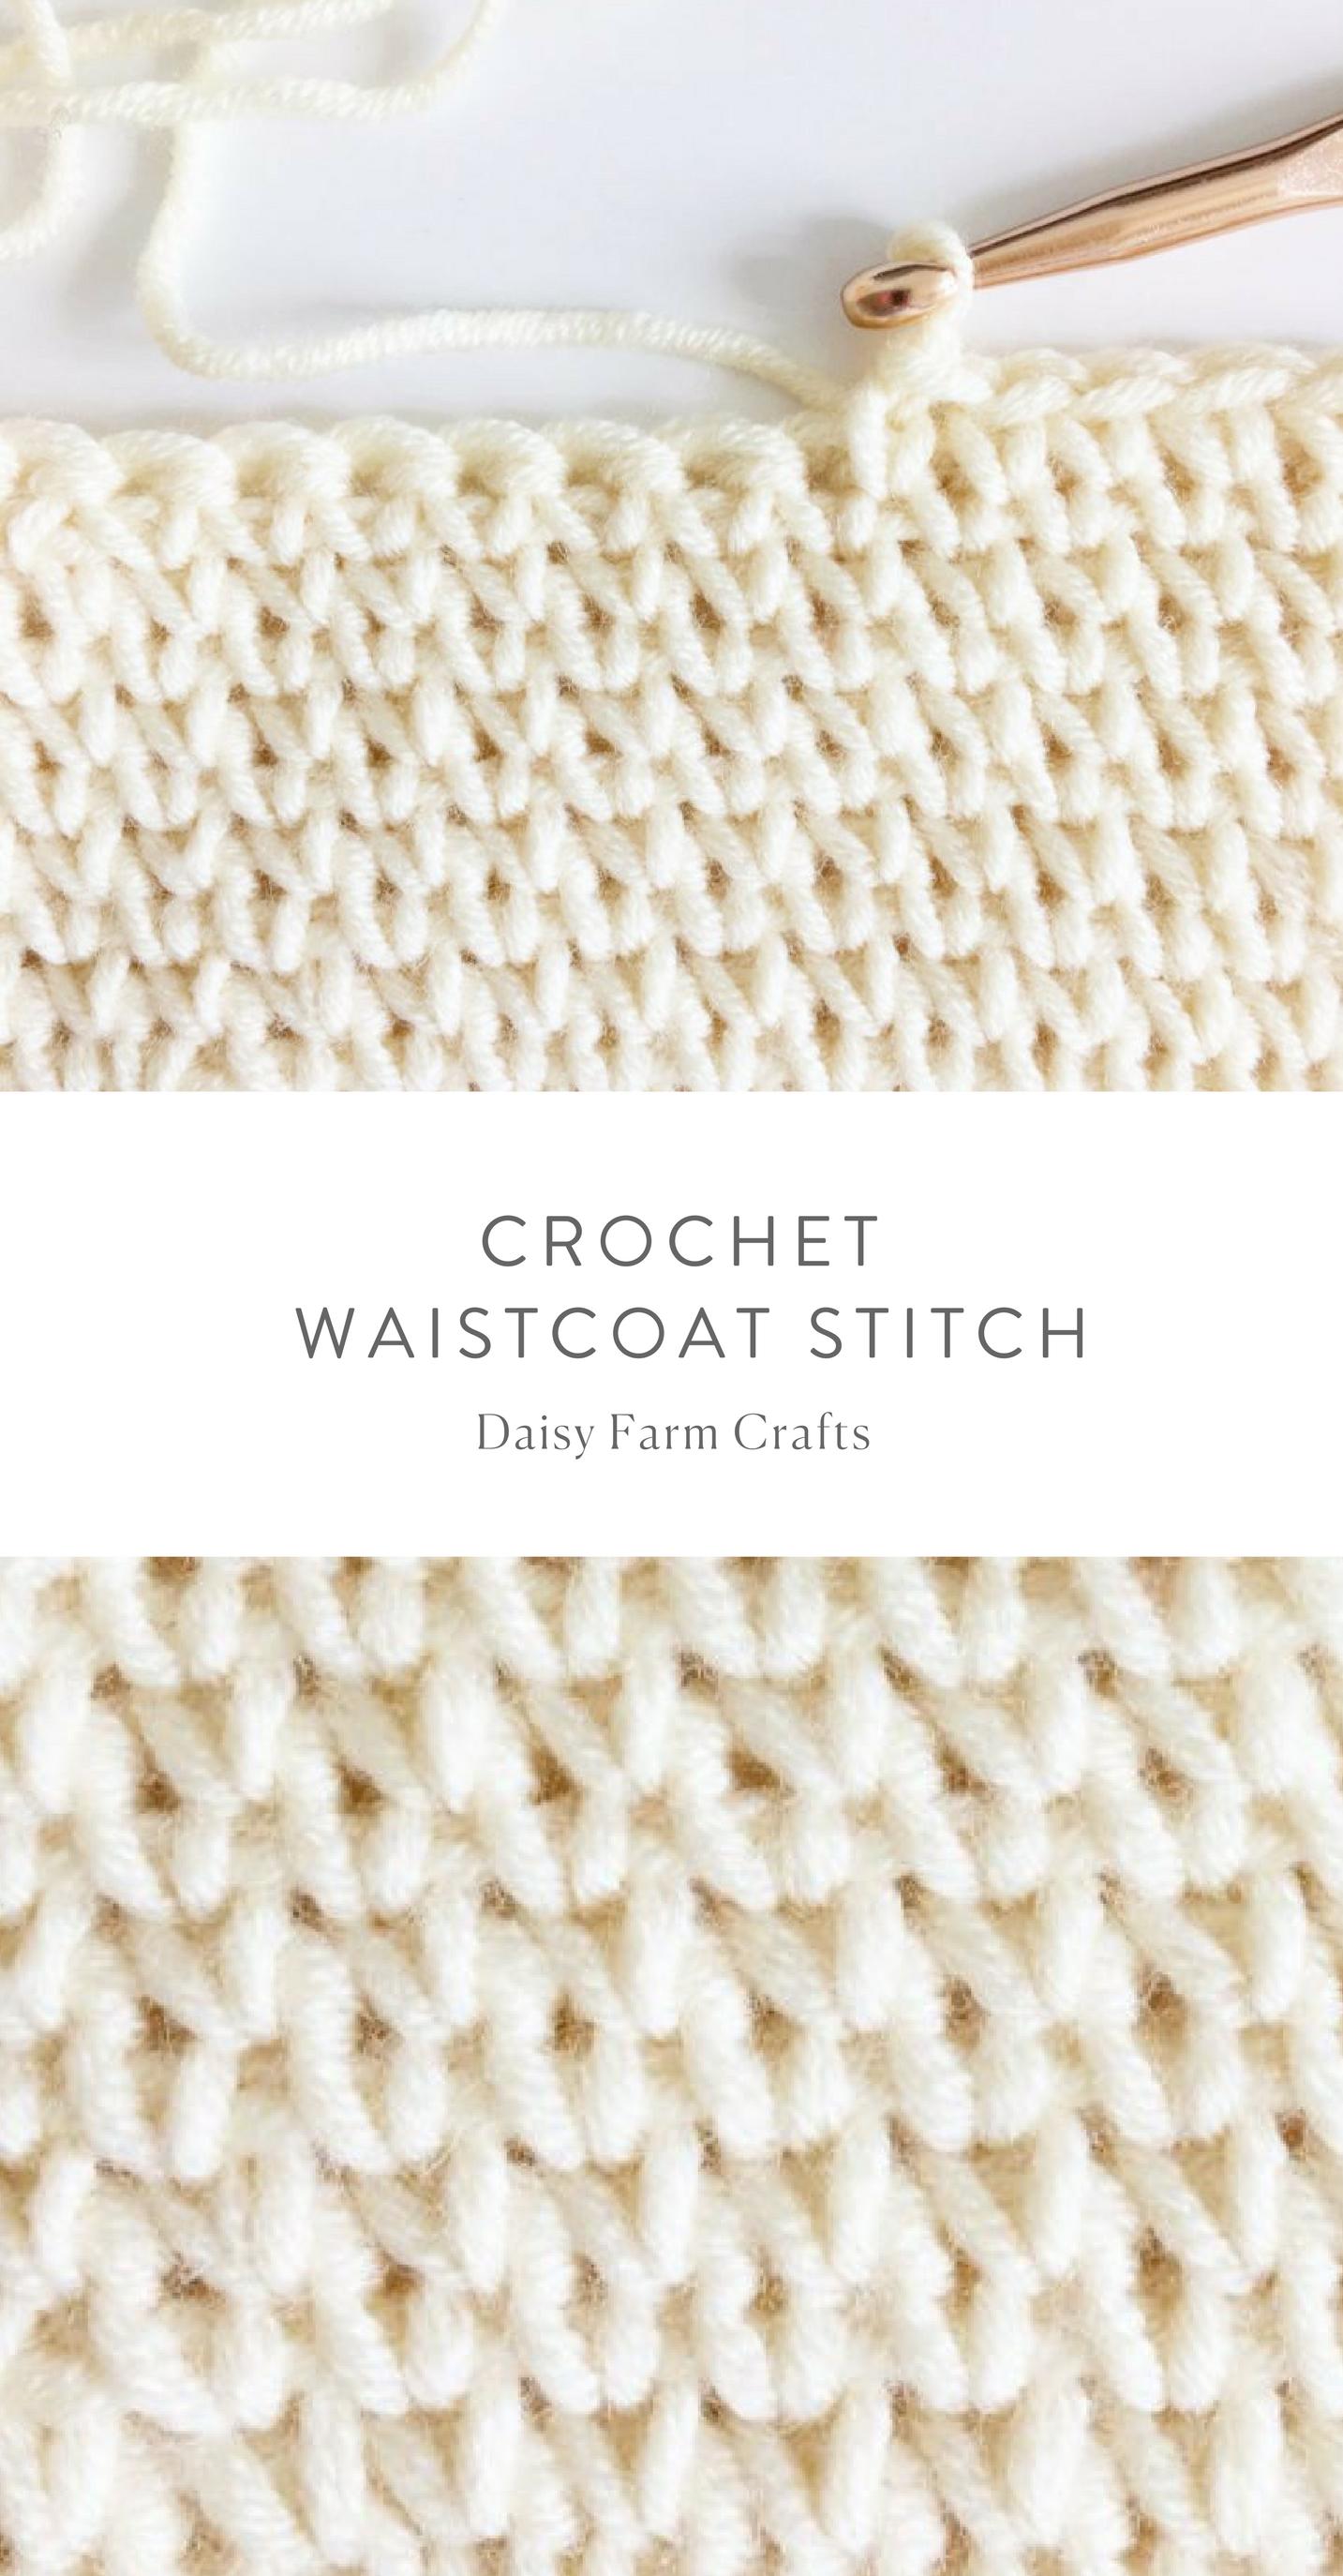 How to crochet the waistcoat stitch - #crochet | crochet technique ...